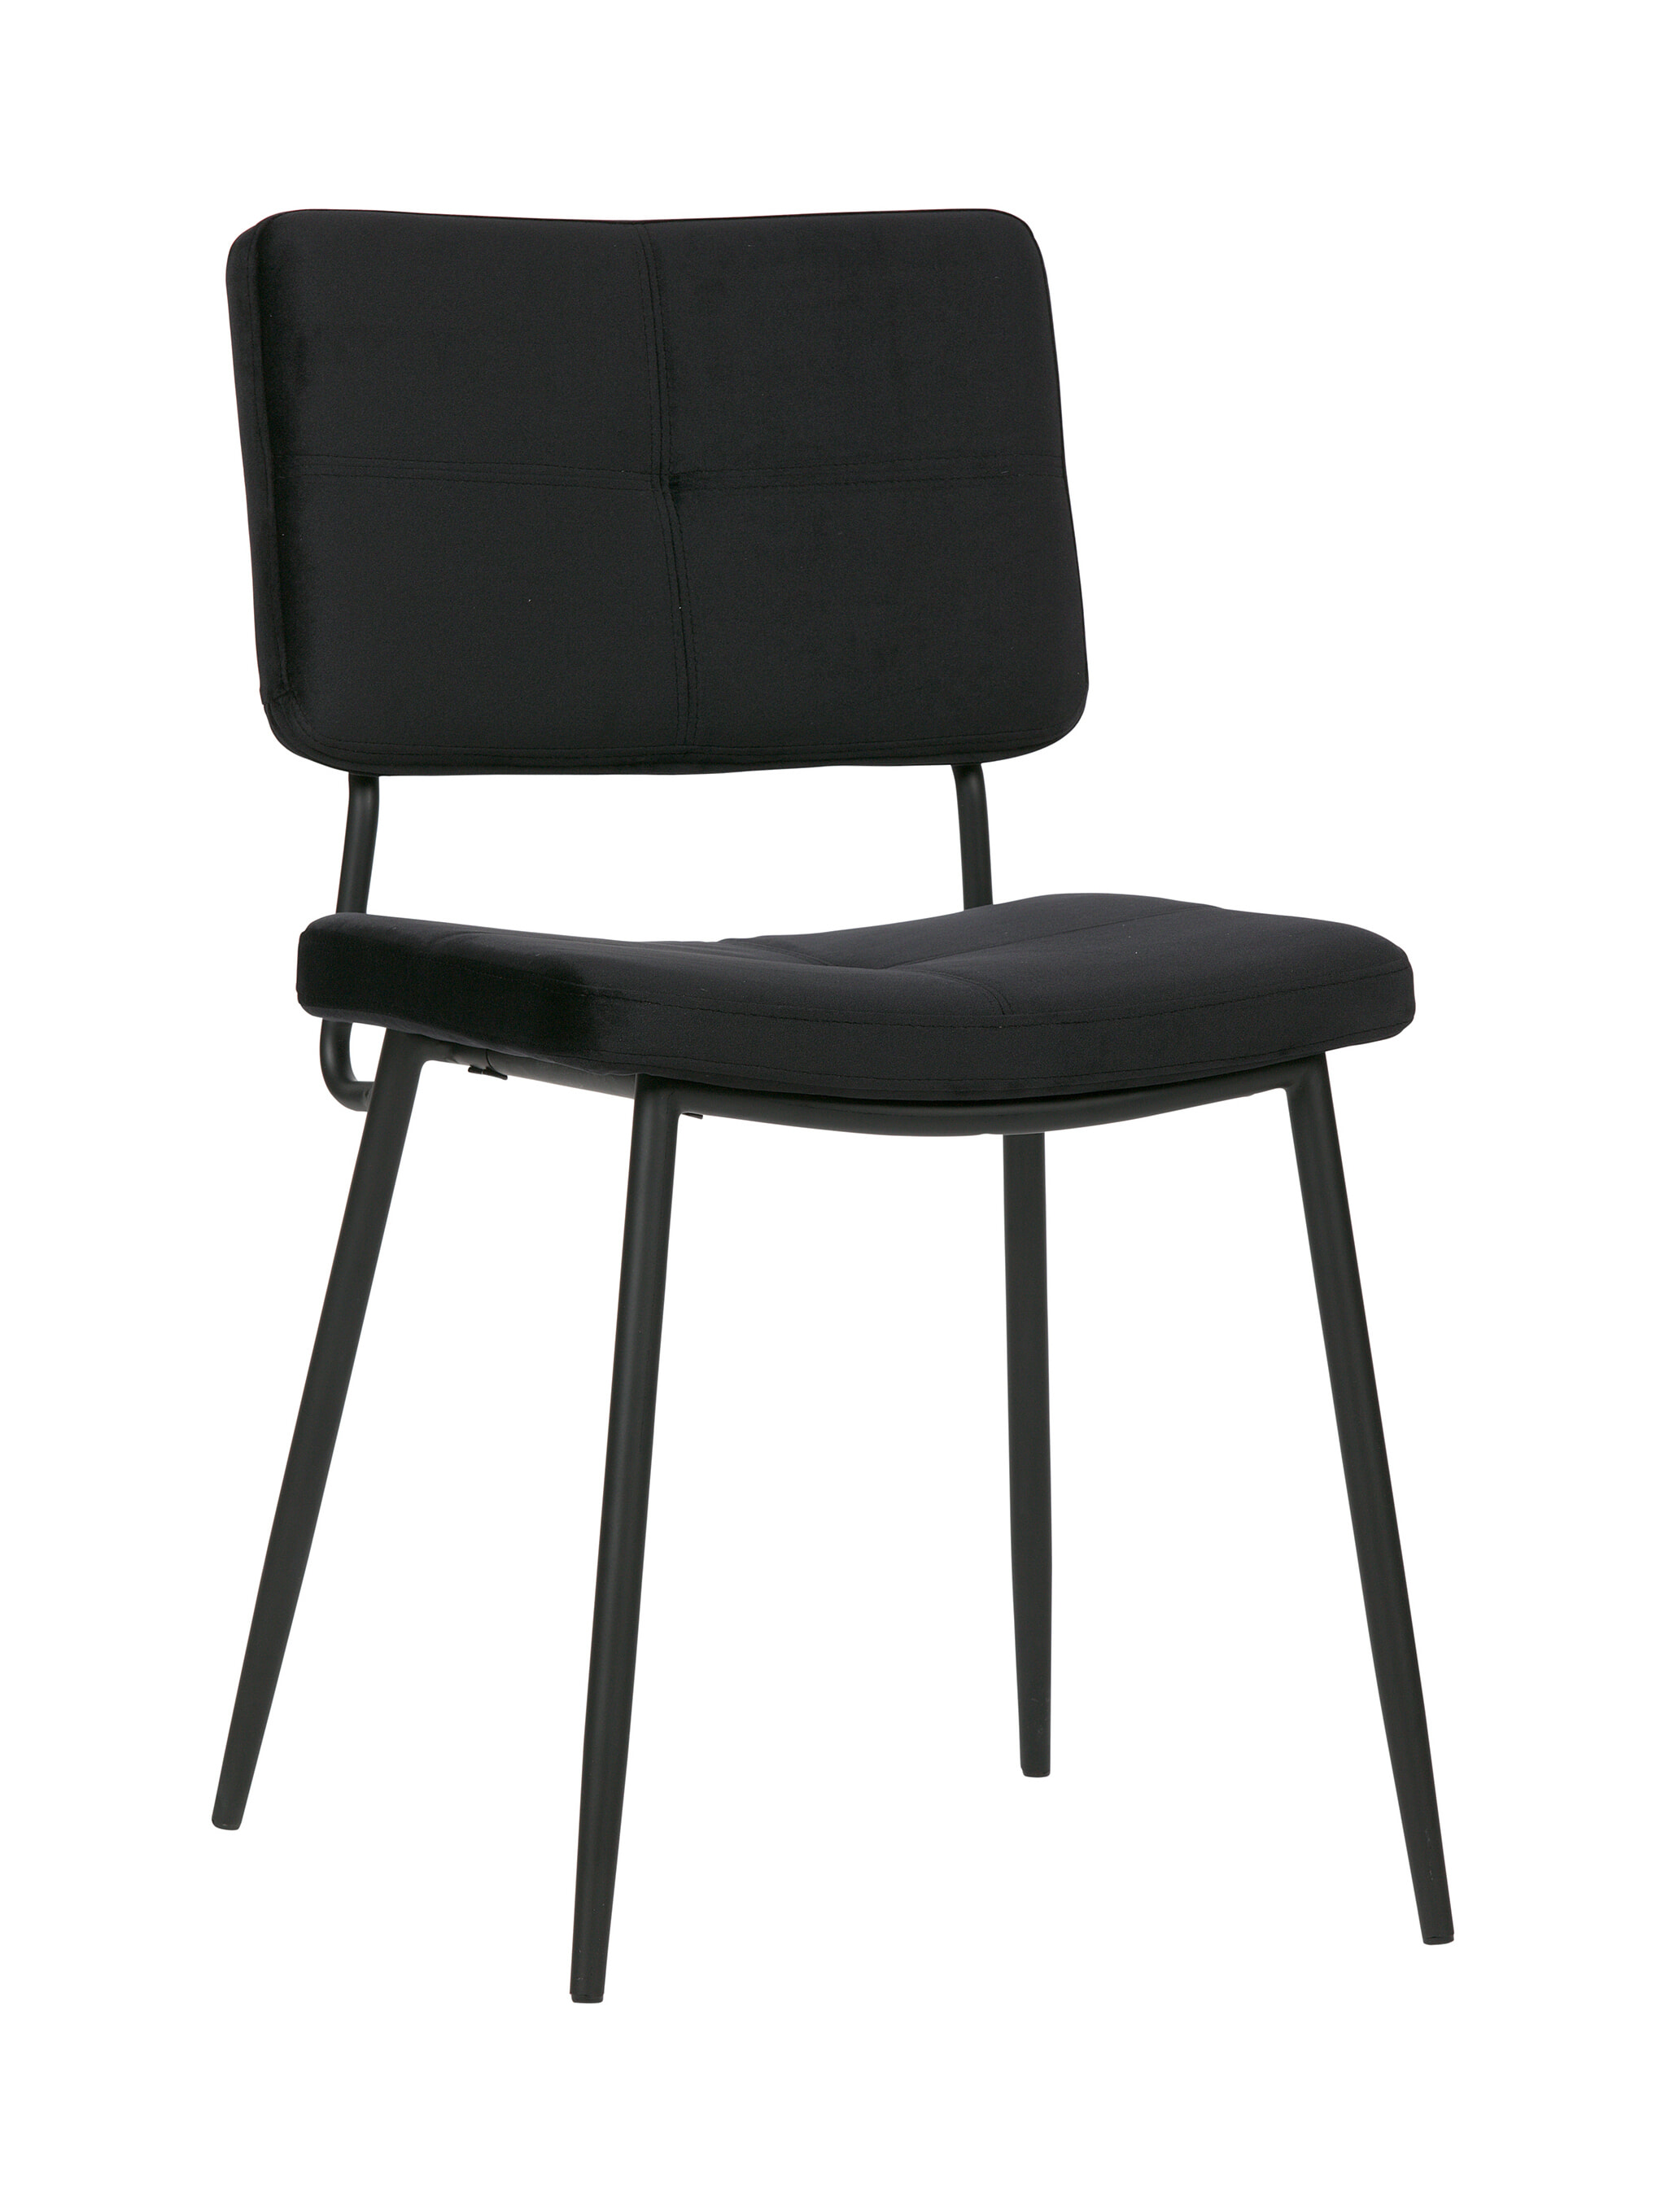 WOOOD Eetkamerstoel 'Kaat' Velvet, kleur Zwart